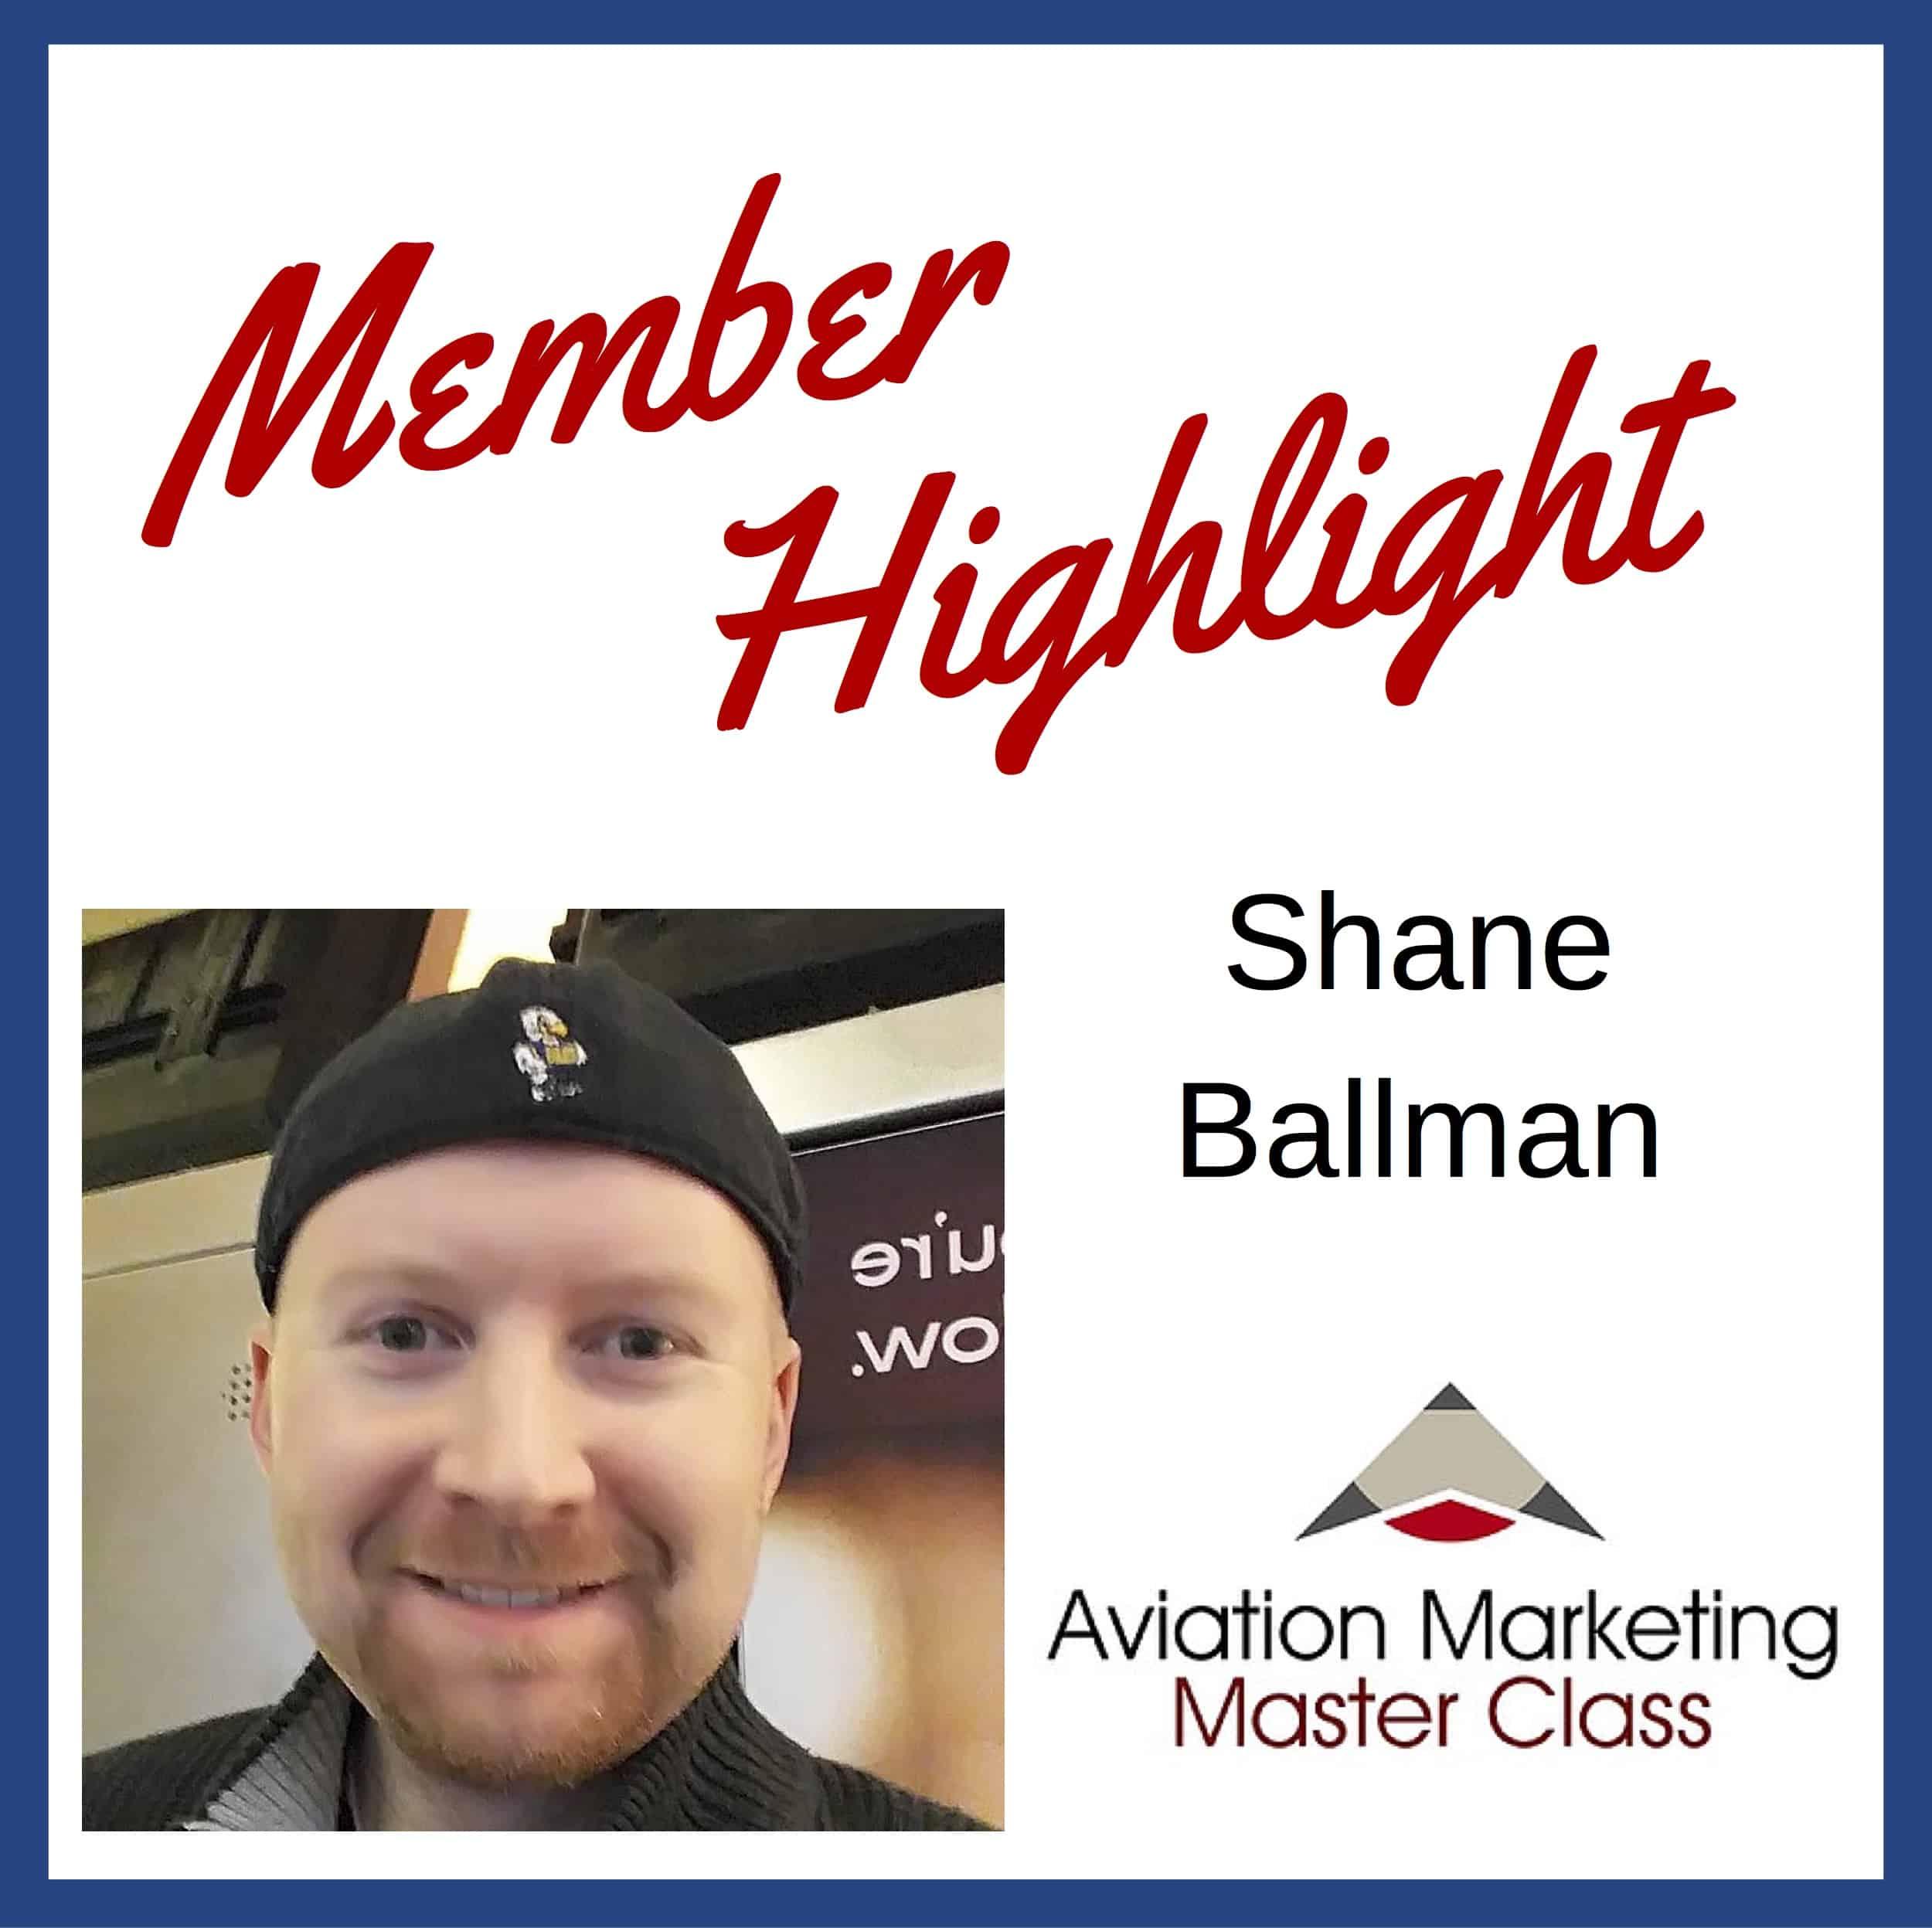 Shane Ballman